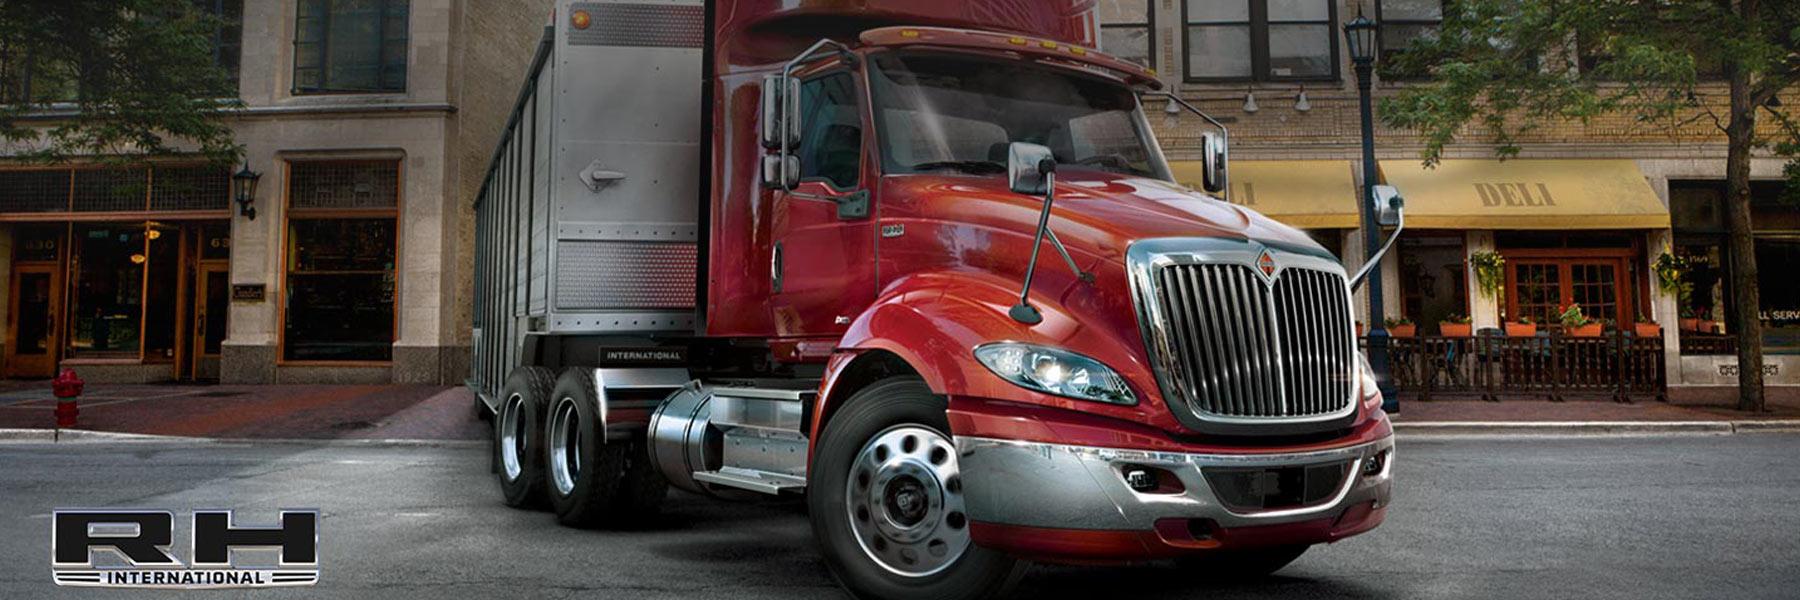 RH Series International Truck